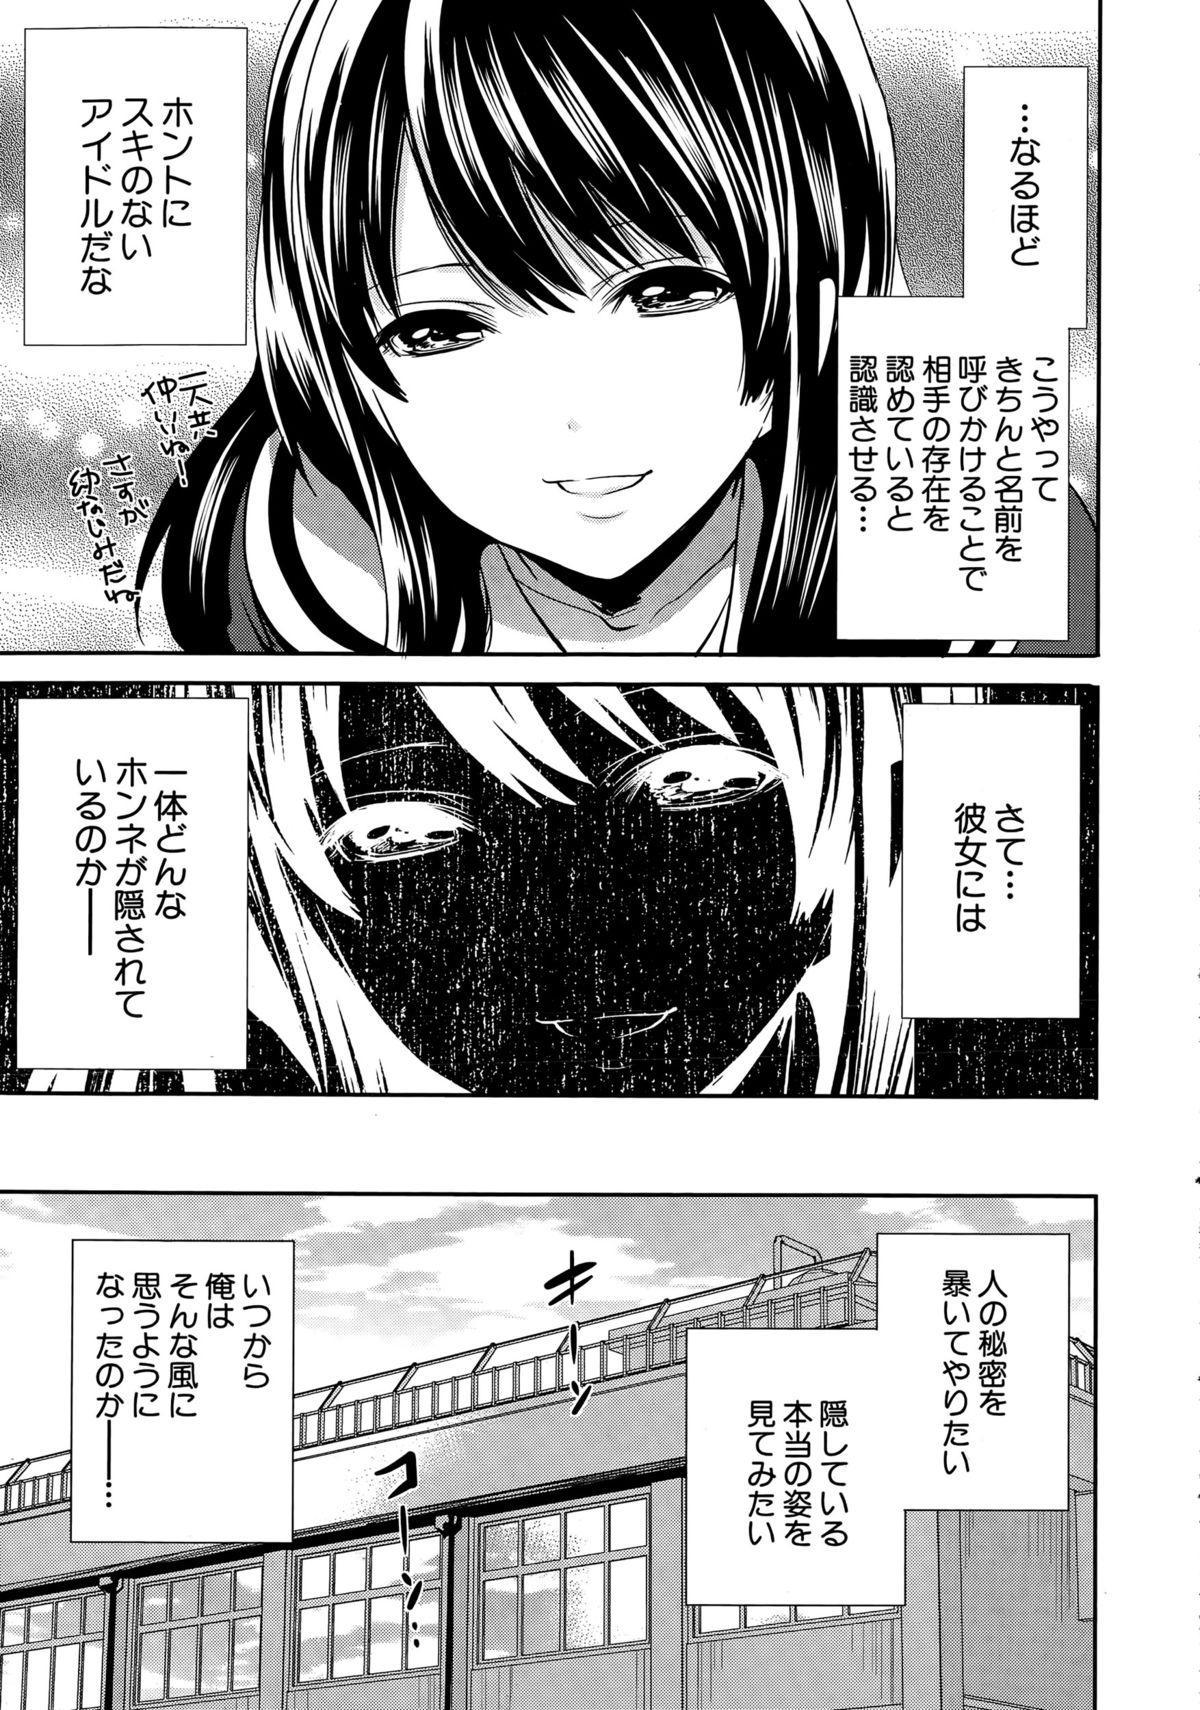 COMIC Mugen Tensei 2015-05 131